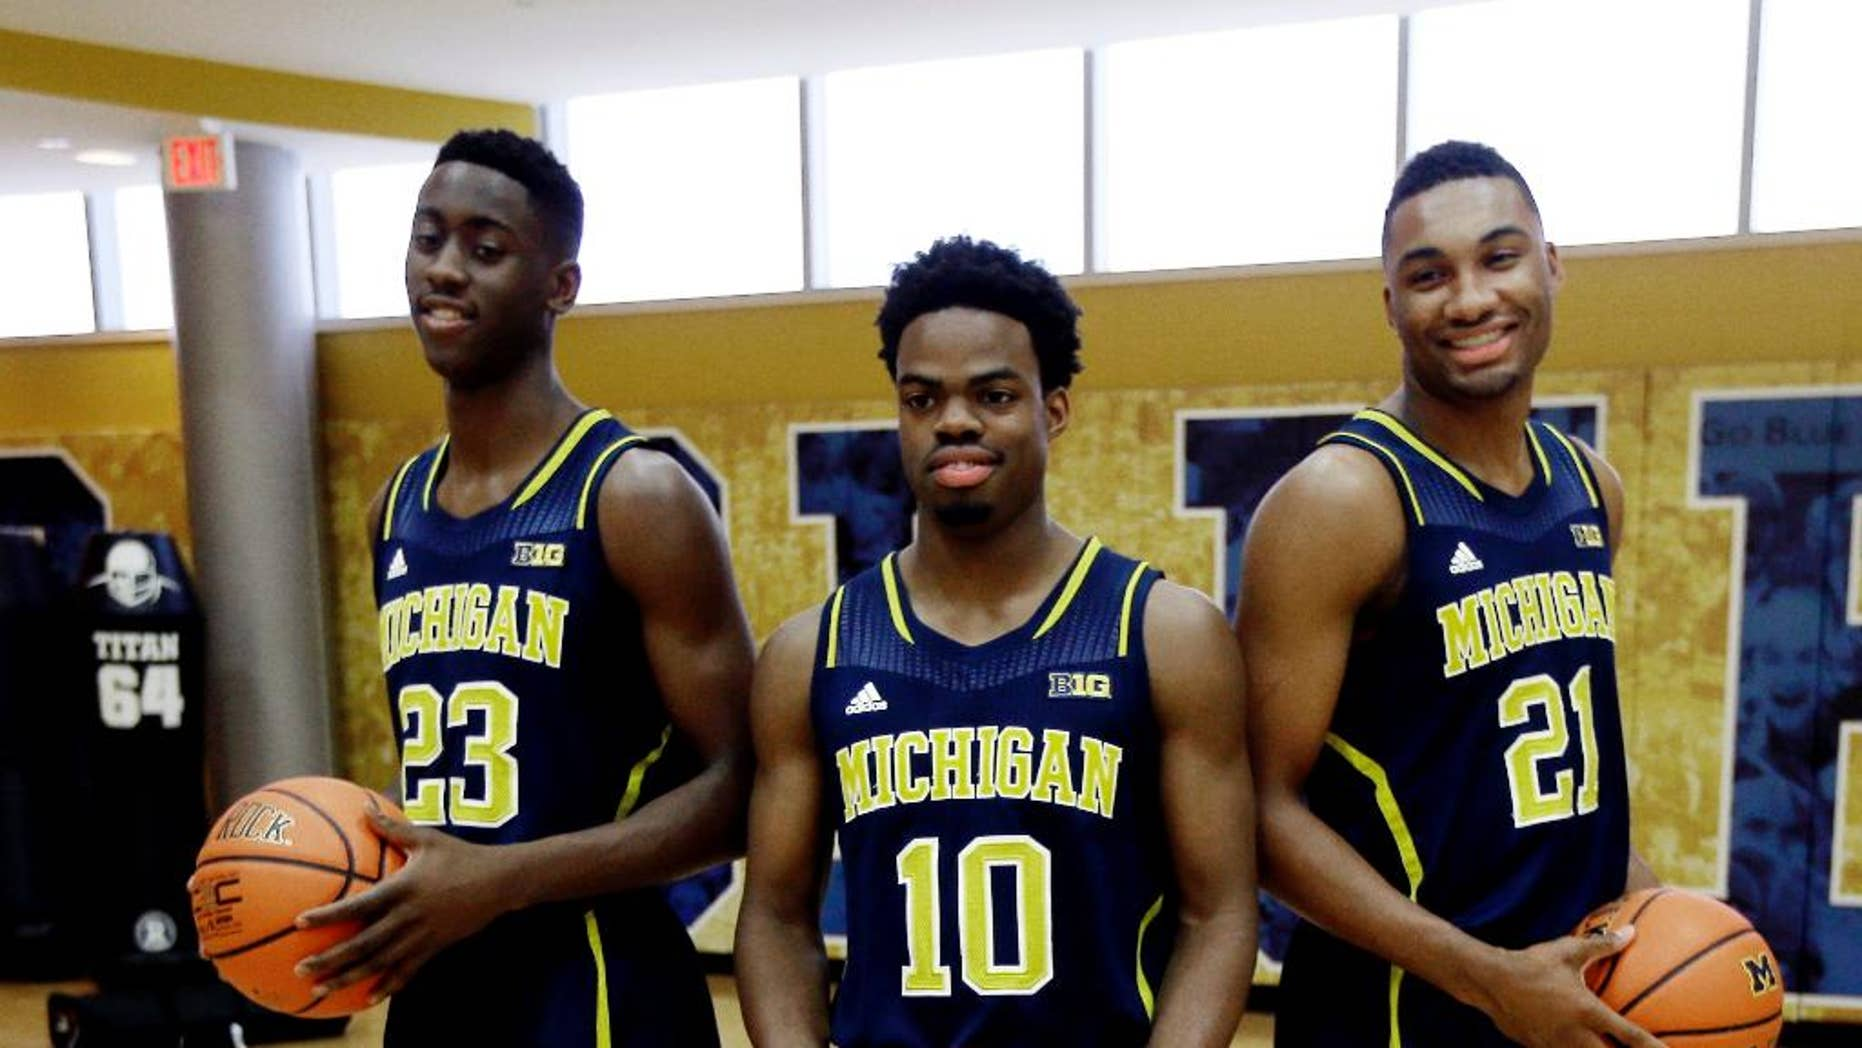 Michigan guard Caris Levert (23), Derrick Walton Jr., (10) and Zak Irvin (21) pose during the men's NCAA college basketball media day in Ann Arbor, Mich., Thursday, Oct. 30, 2014. (AP Photo/Carlos Osorio)